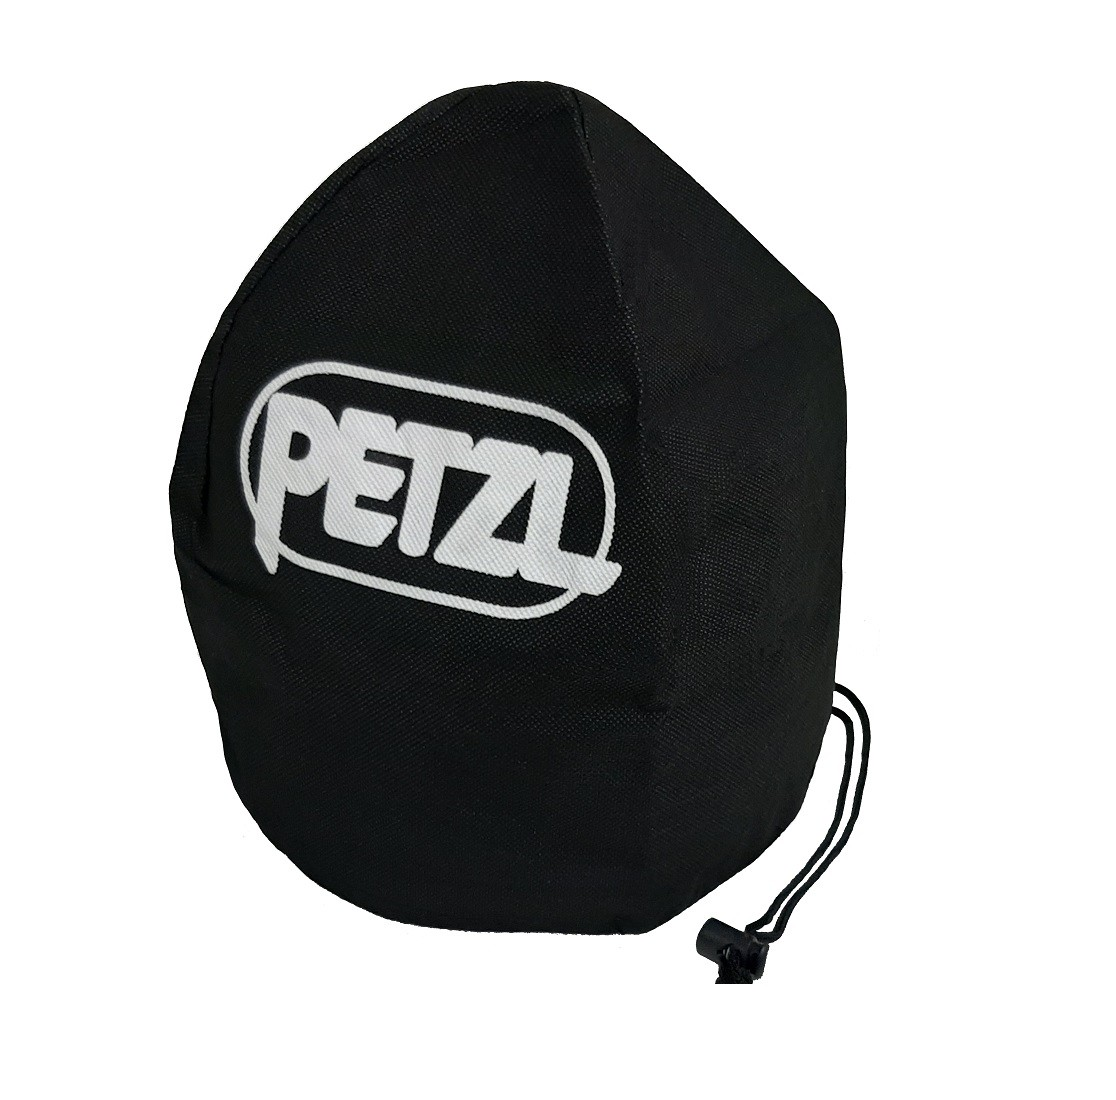 Capa Protetora para Armazenar Capacete - Petzl